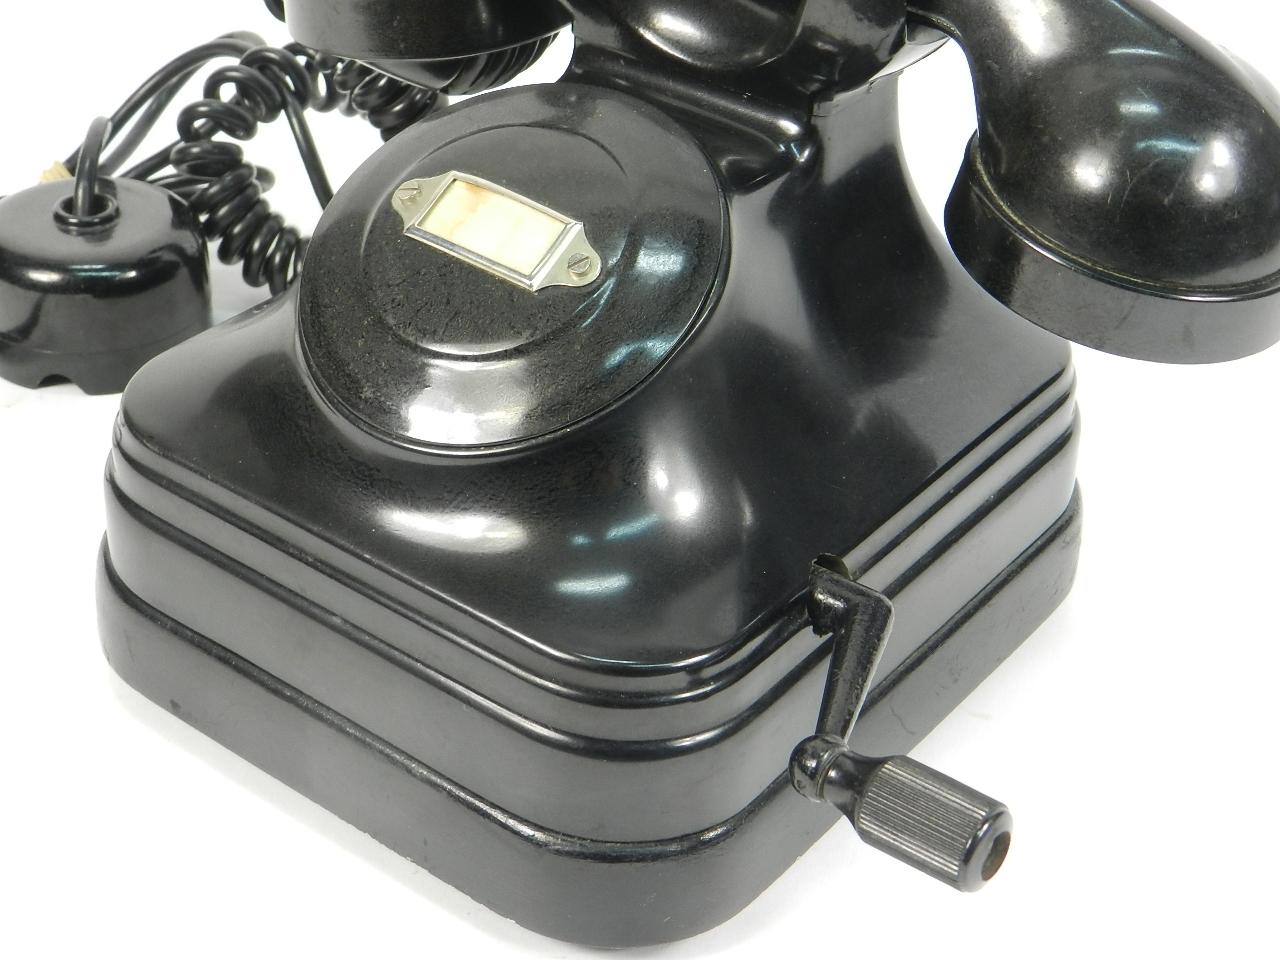 Imagen TELEFONO CON MAGNETO AÑO 1940 41432